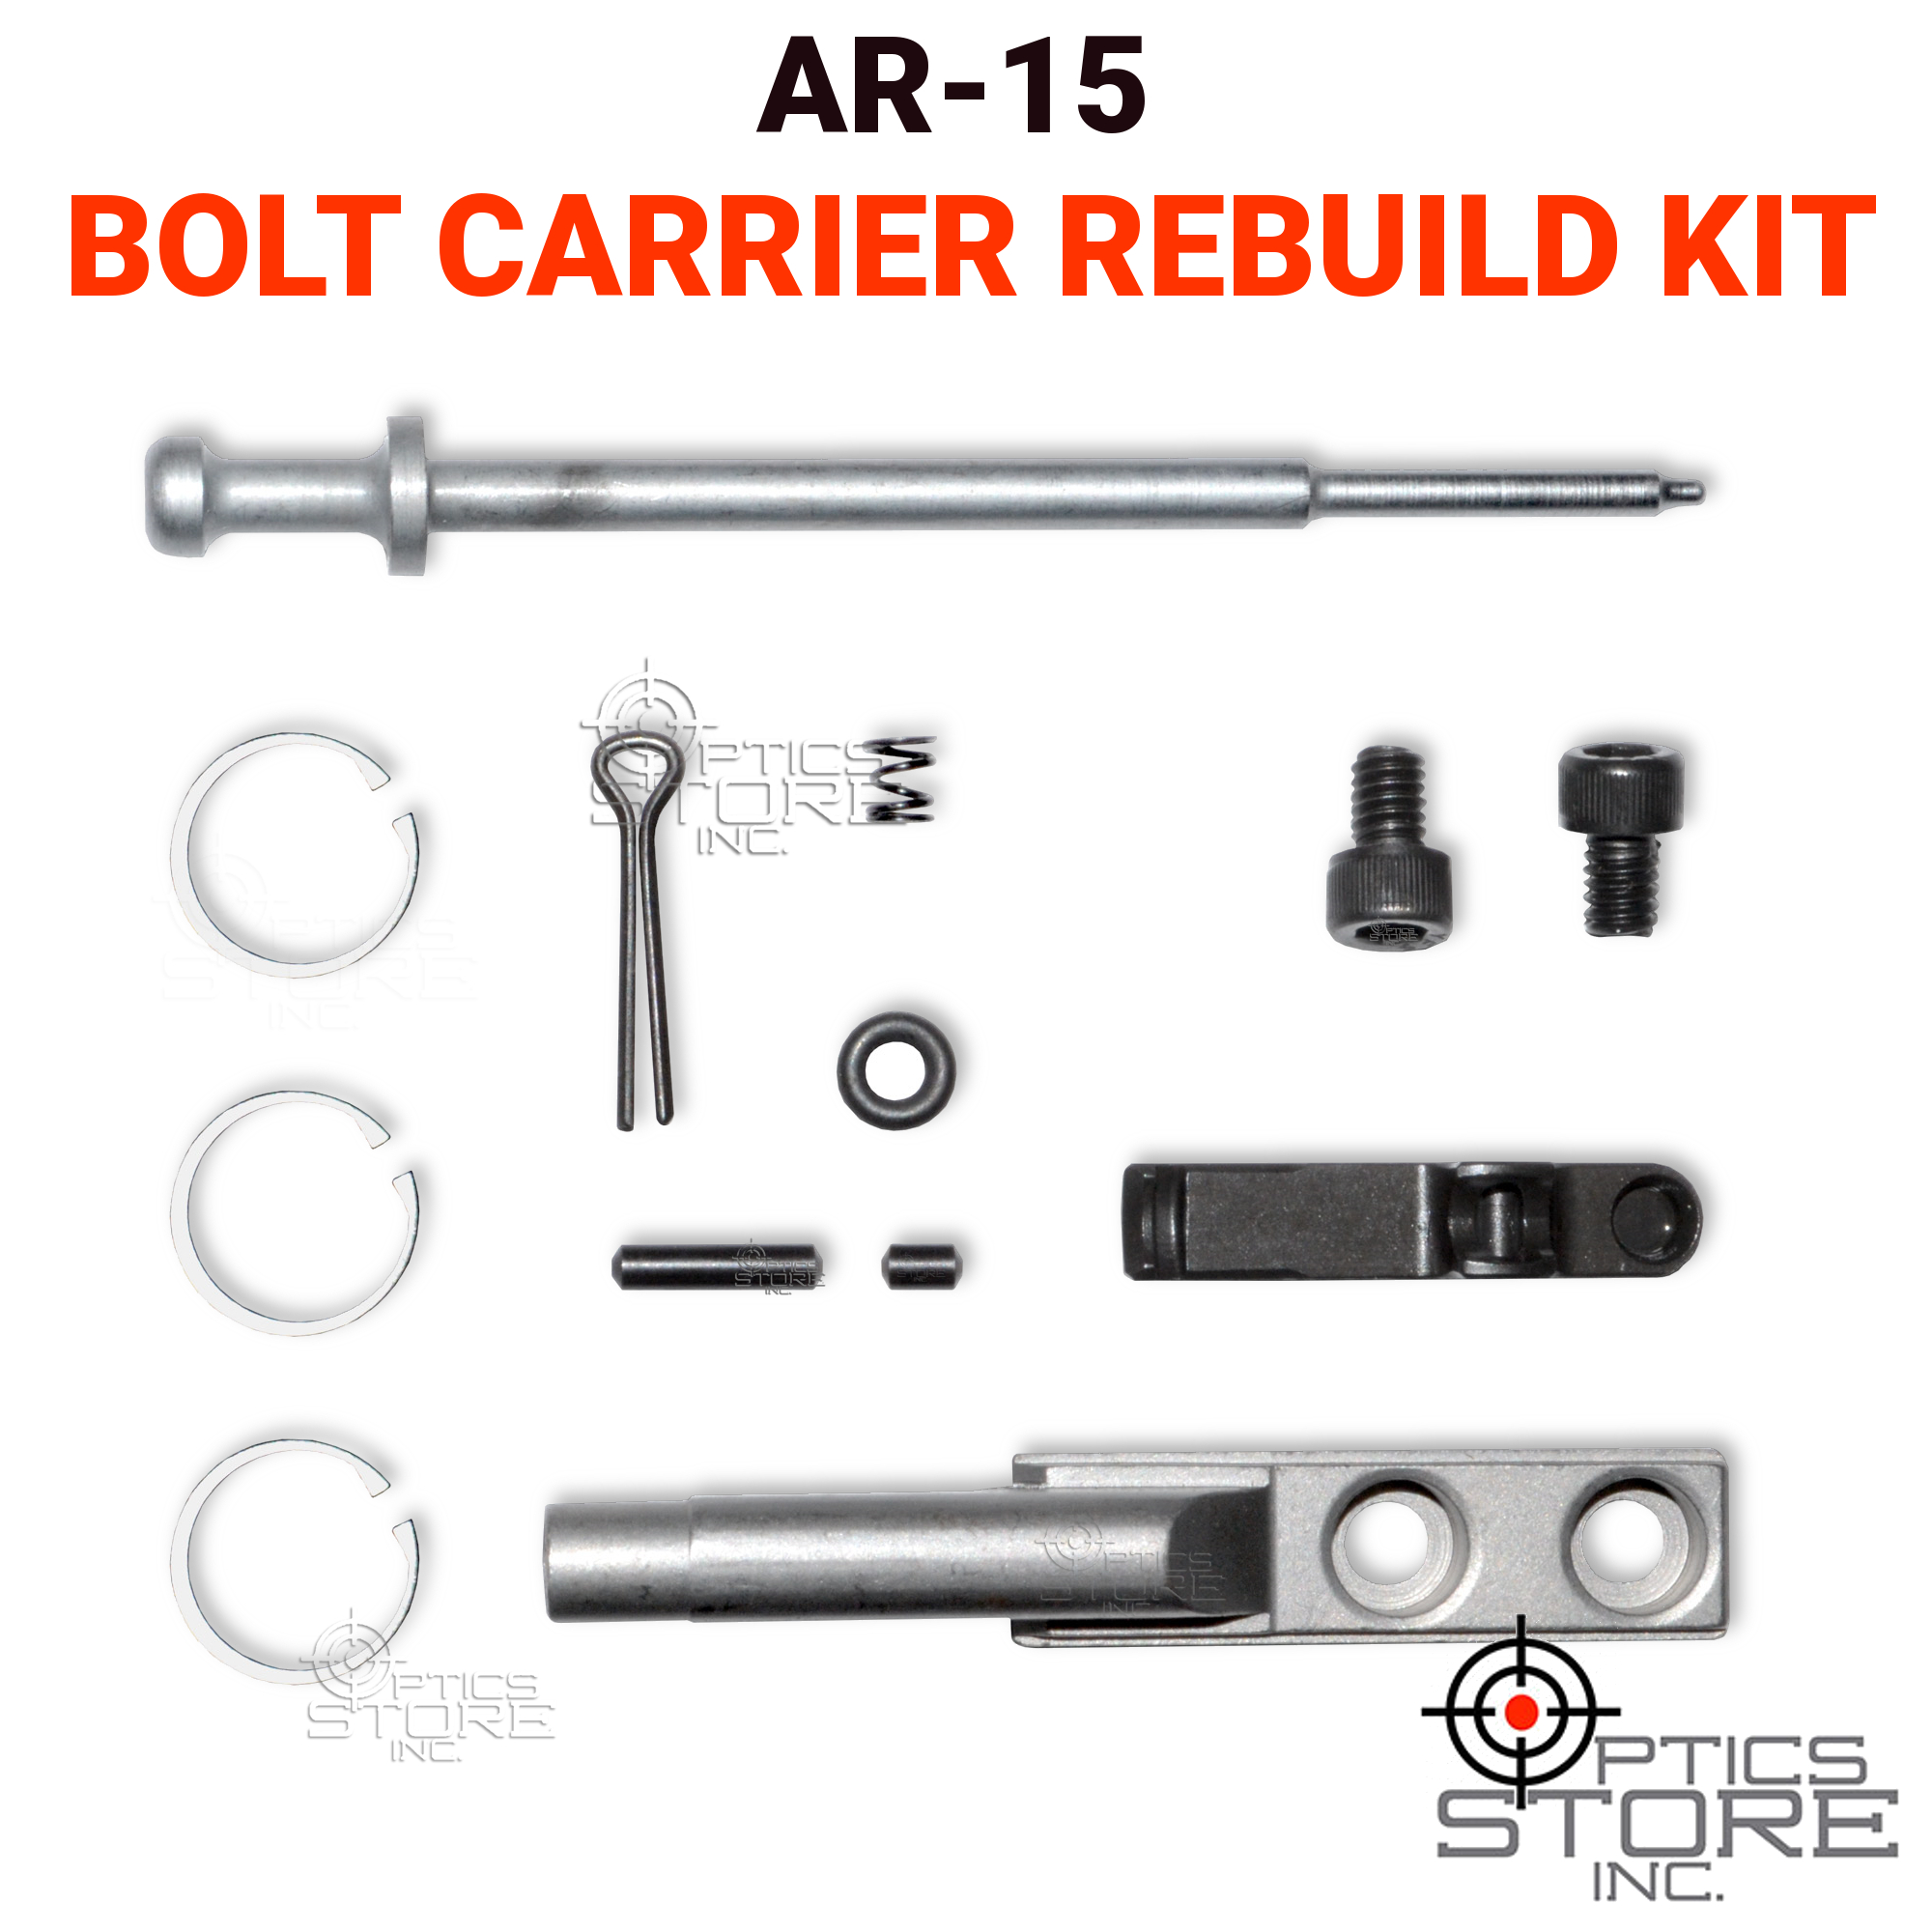 Sniper AR-15 Bolt Carrier Rebuild Kit for .223/5.56 AR15/M4